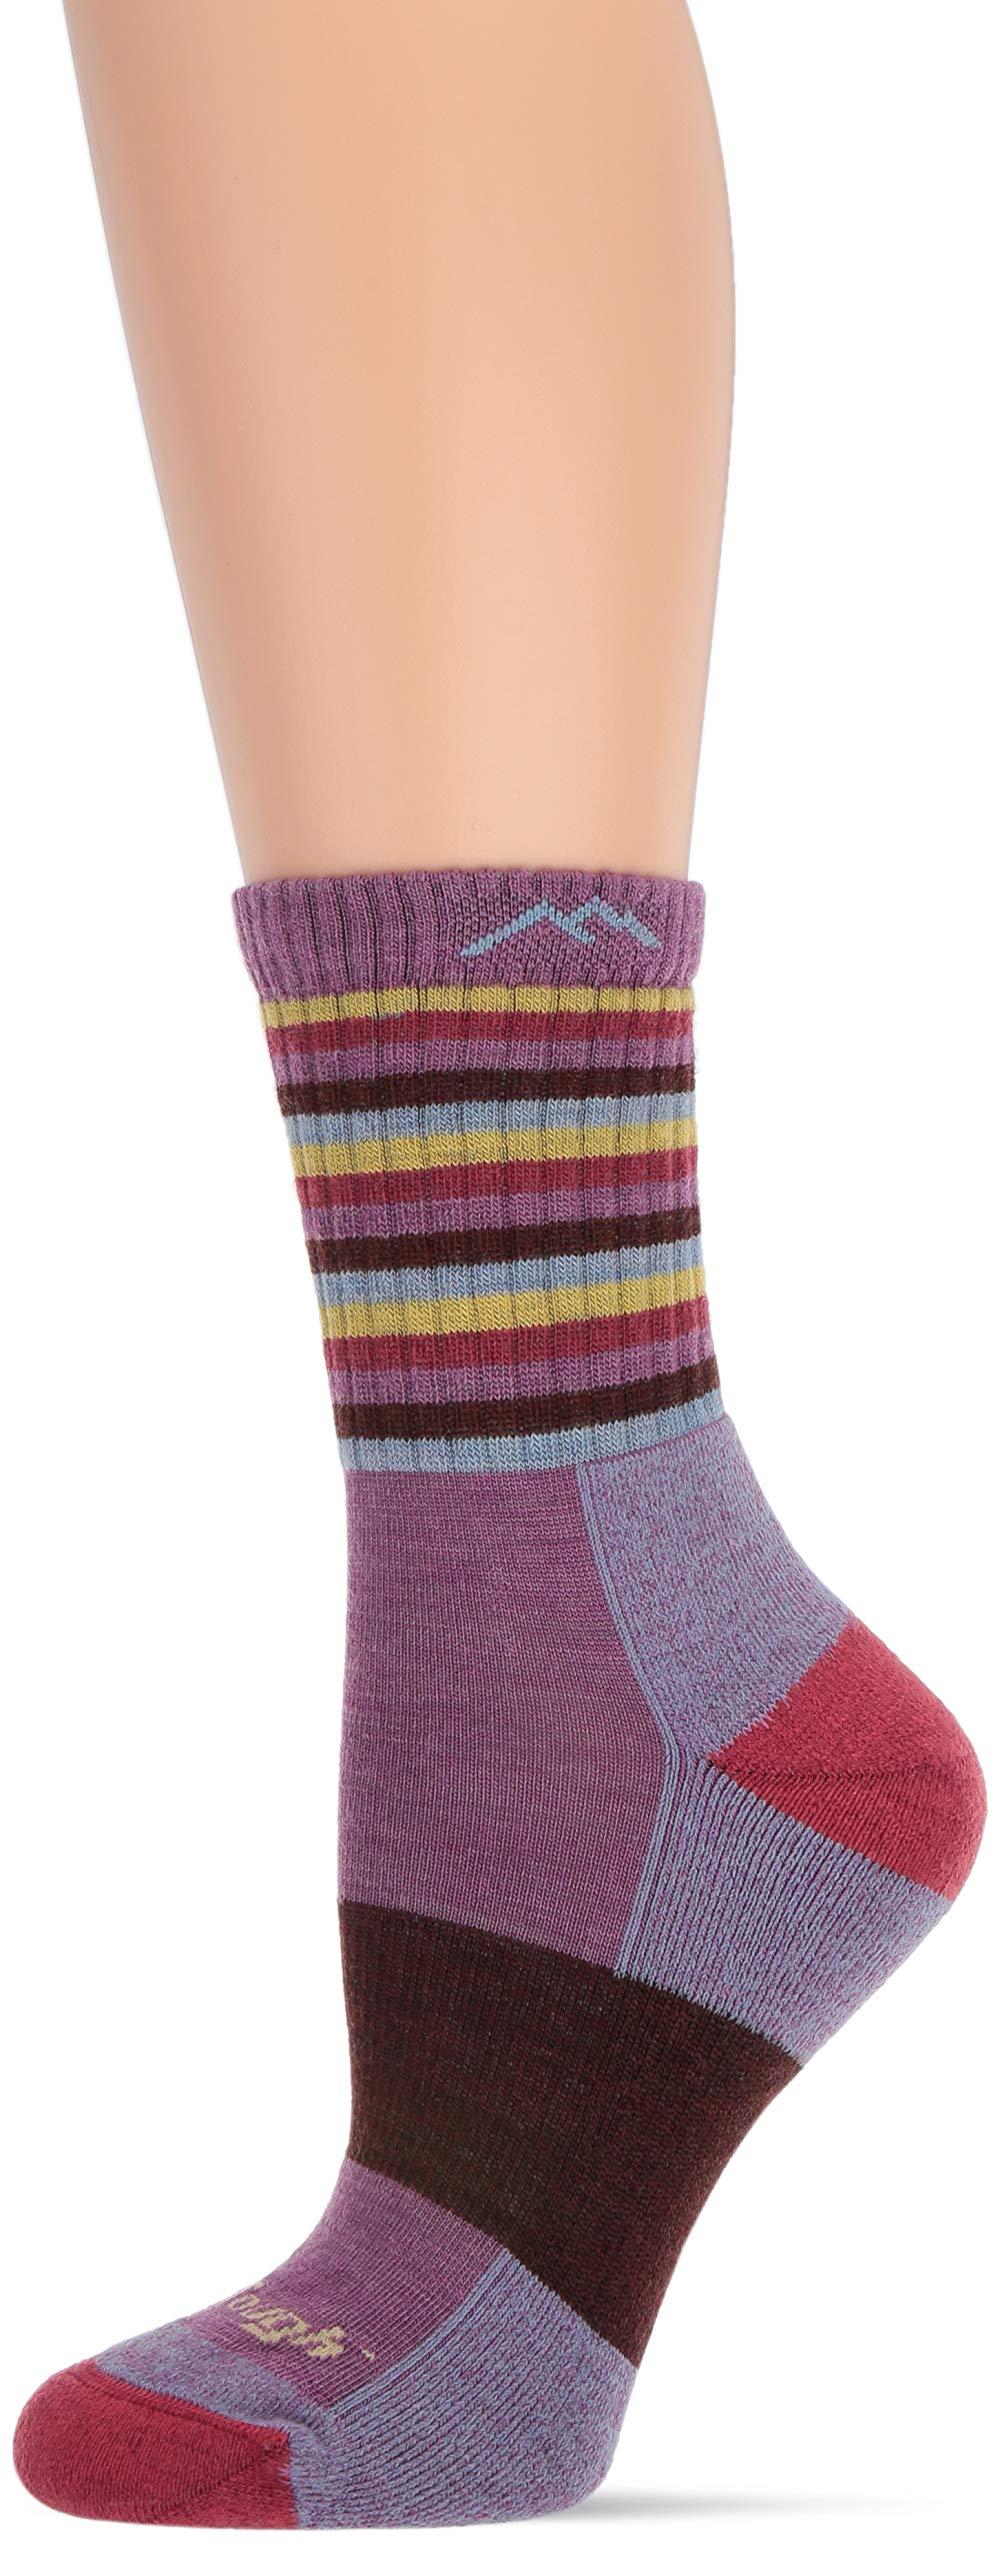 Darn Tough Vermont Women's Merino Wool Micro Crew Stripes Cushion Socks Plum Stripe LG (US 10-11.5) by Darn Tough